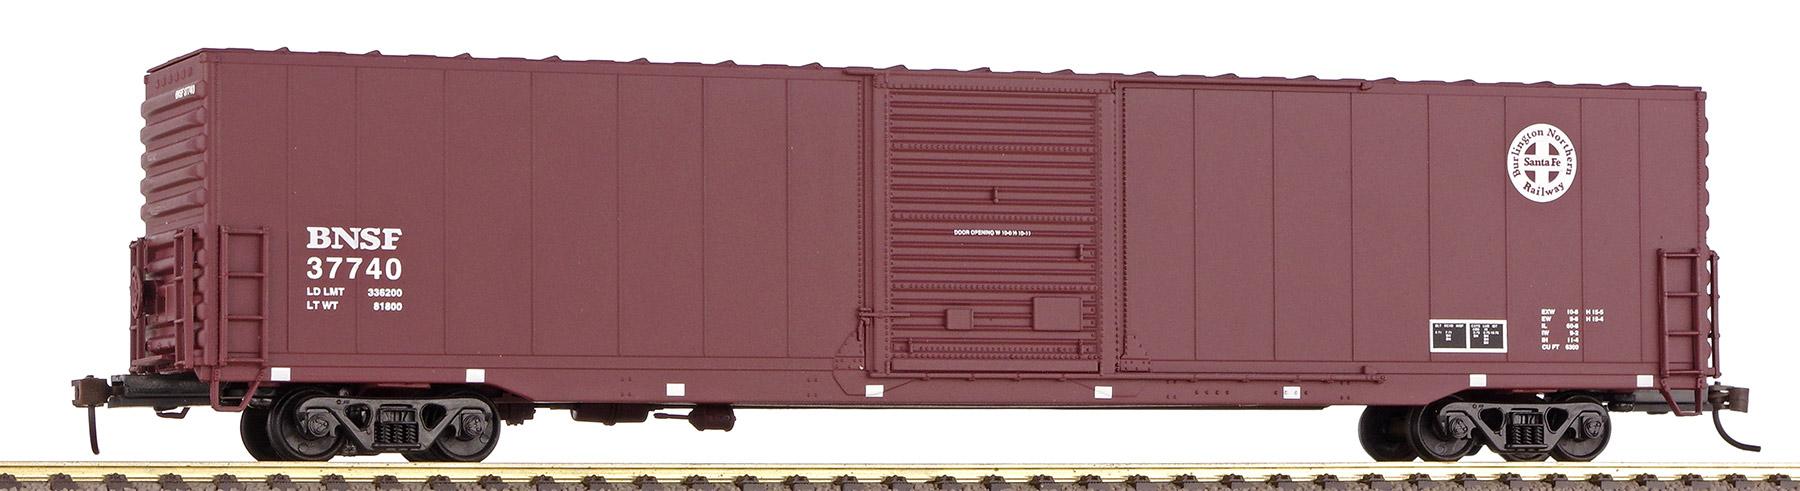 модель TRAIN 15944-85